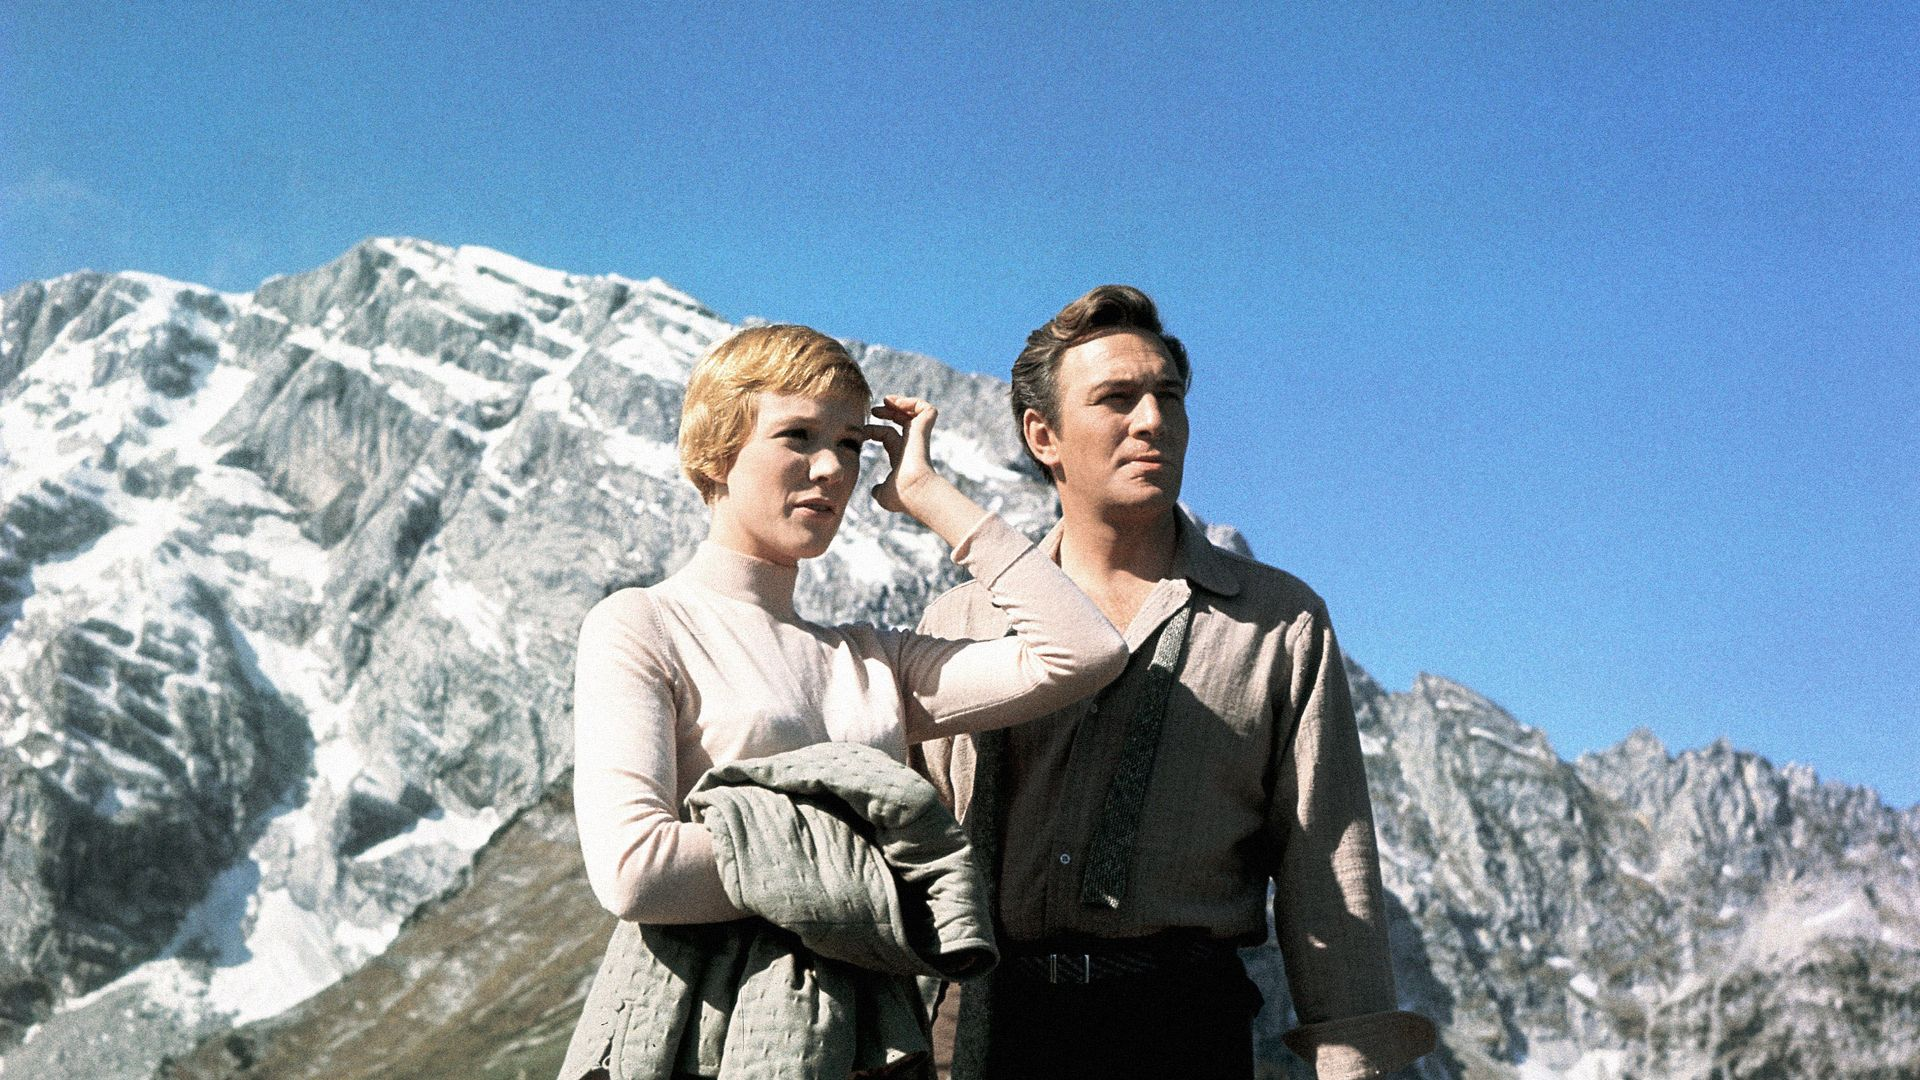 THE SOUND OF MUSIC, from left: Julie Andrews, Christopher Plummer, between scenes, on set, 1965.